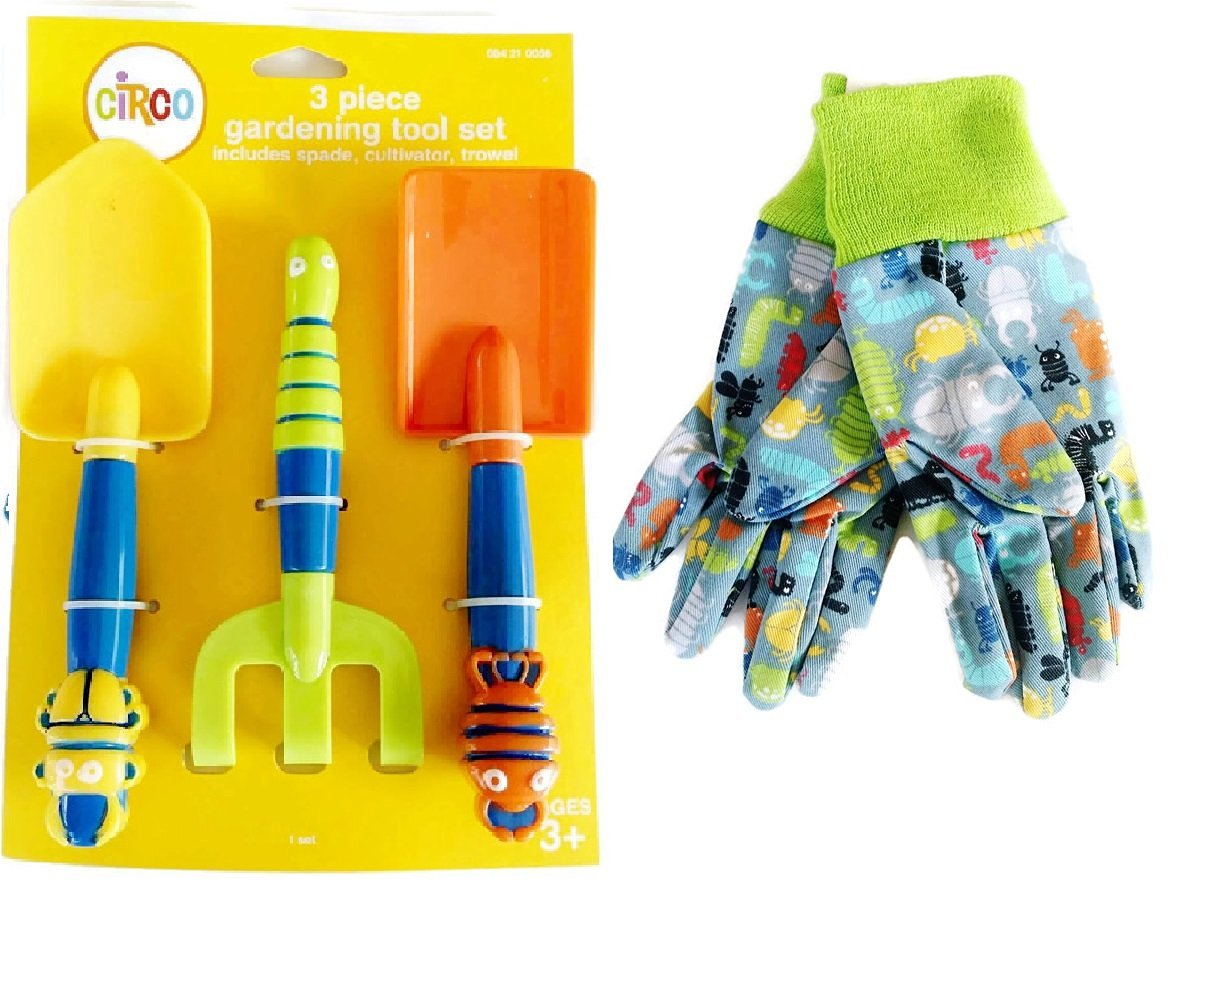 Kids 4 Piece Bug Gardening Bundle - 4 Items - Garden Gloves, and 3 Piece Gardening Tool Set (spade, cultivator, trowel)